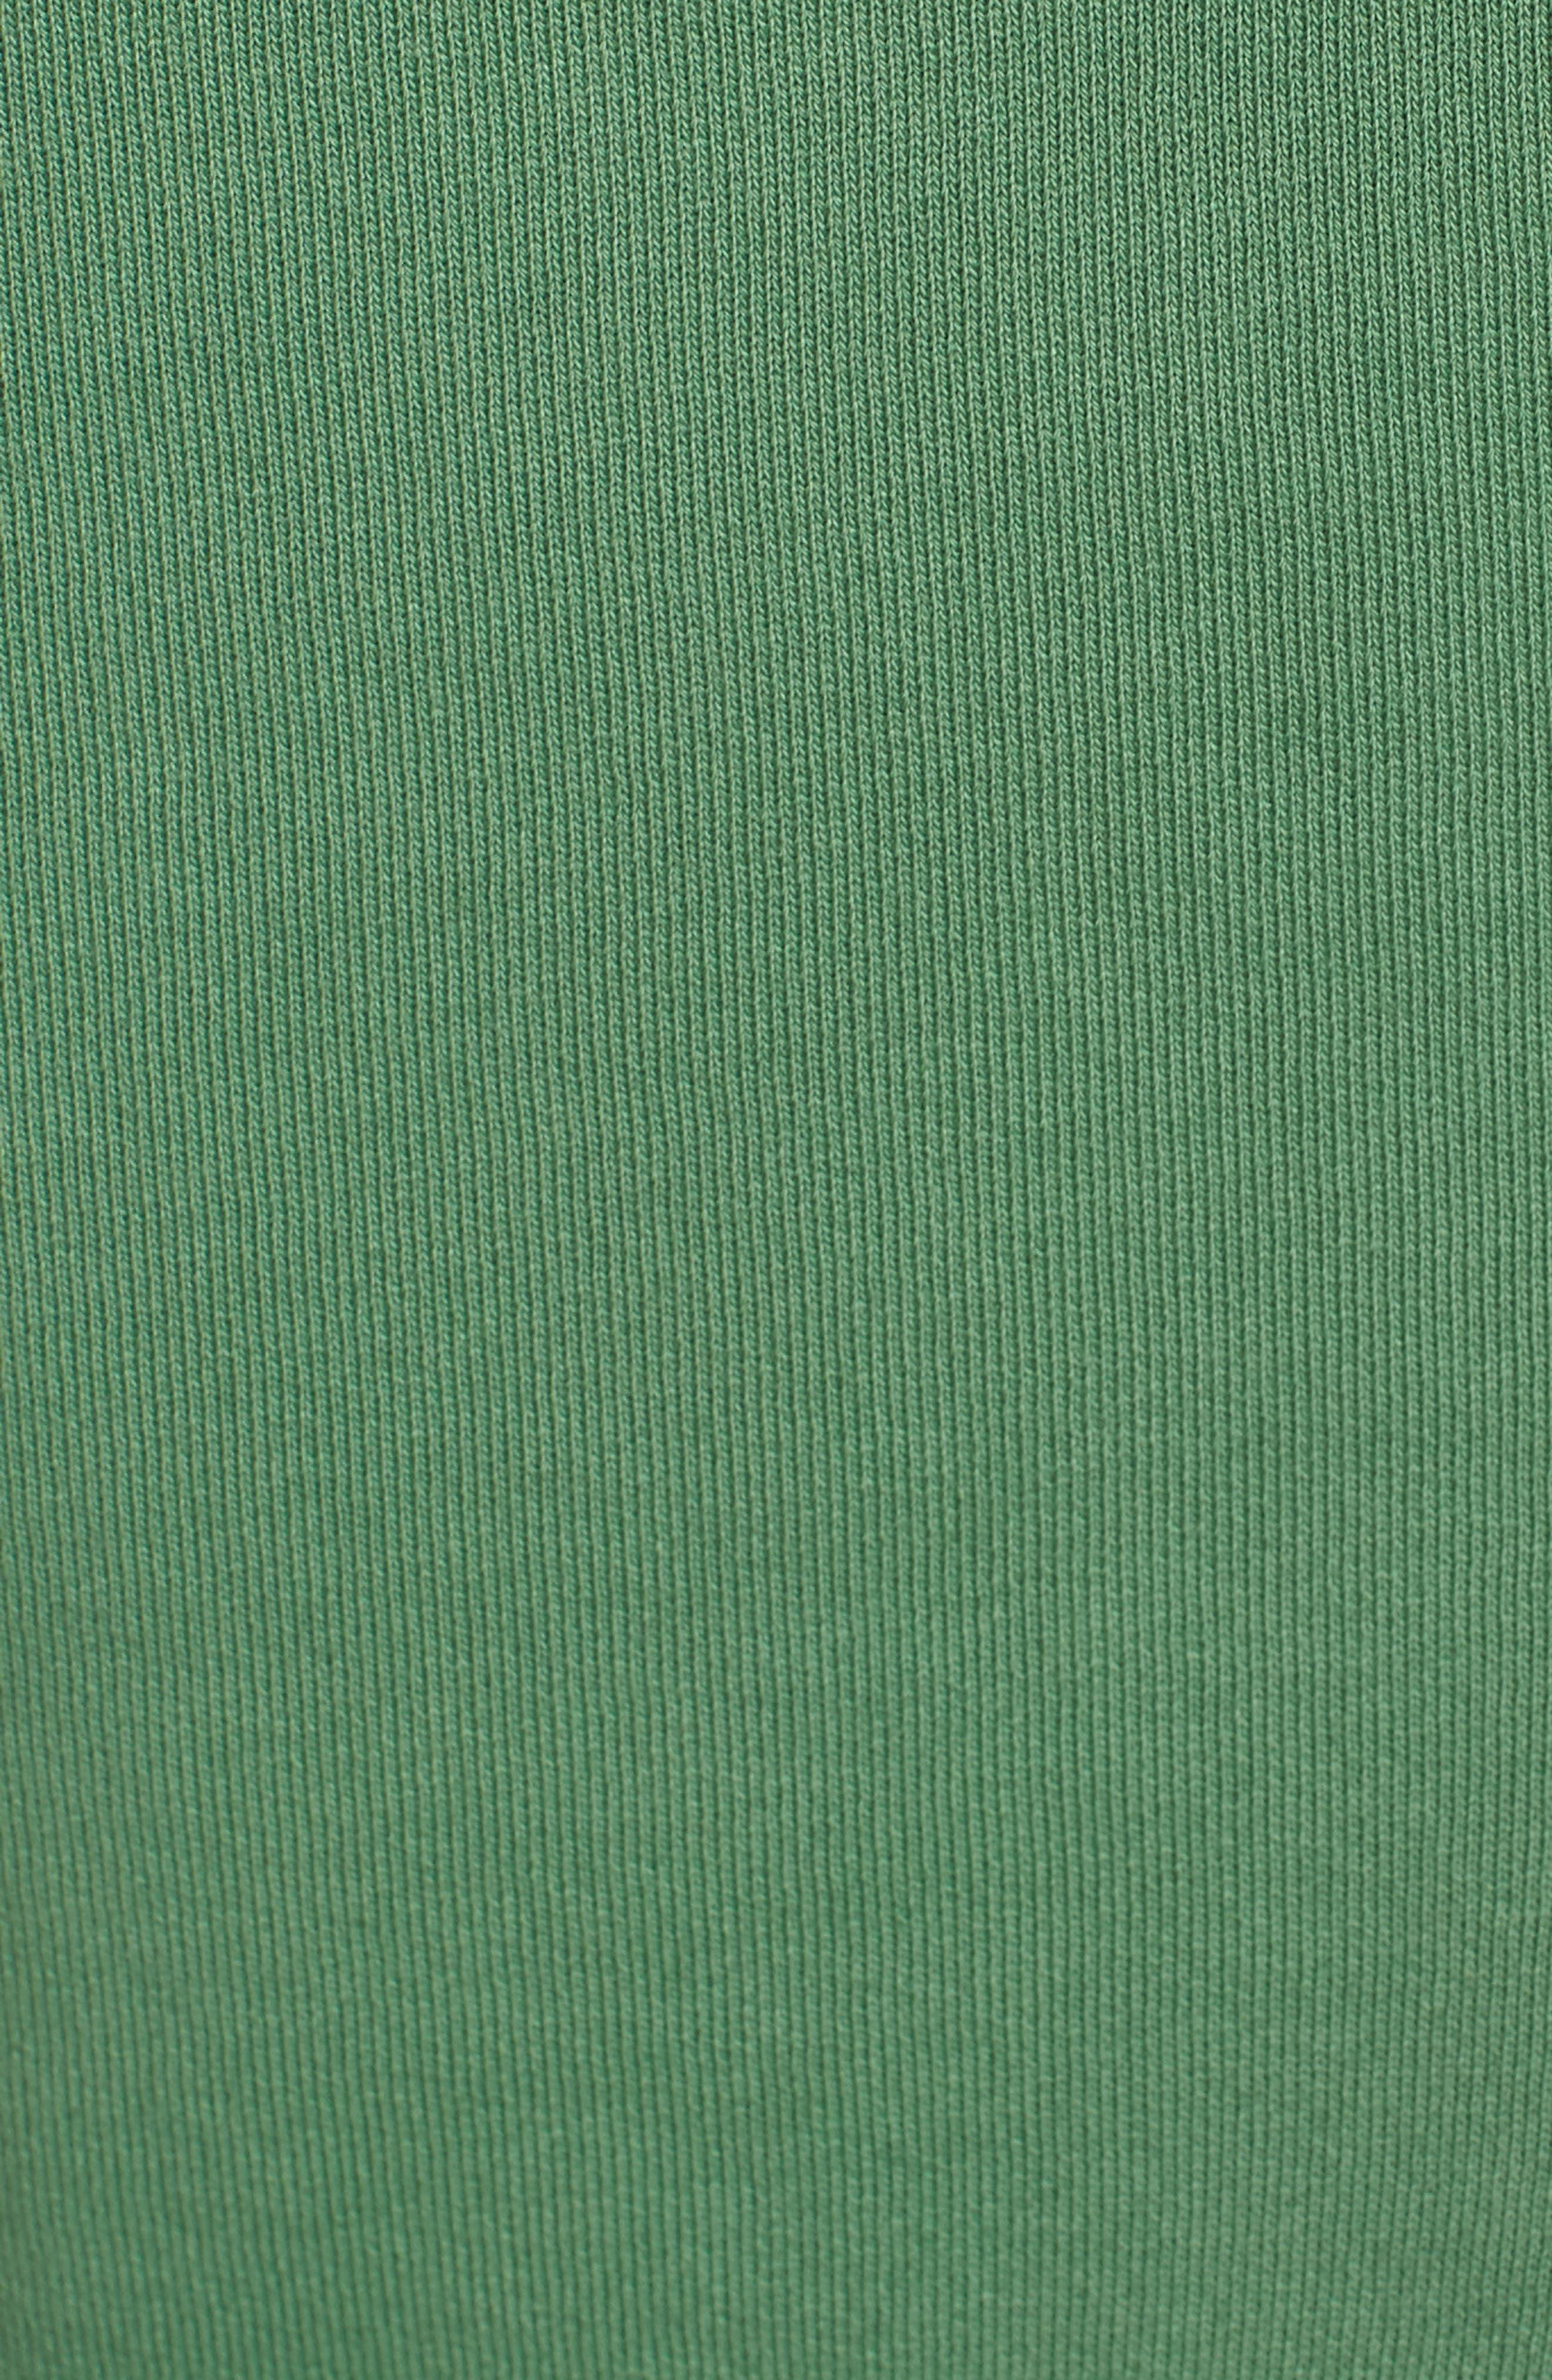 Short Sleeve Pullover Hoodie,                             Alternate thumbnail 6, color,                             Envied 5 Year Vintage Wash